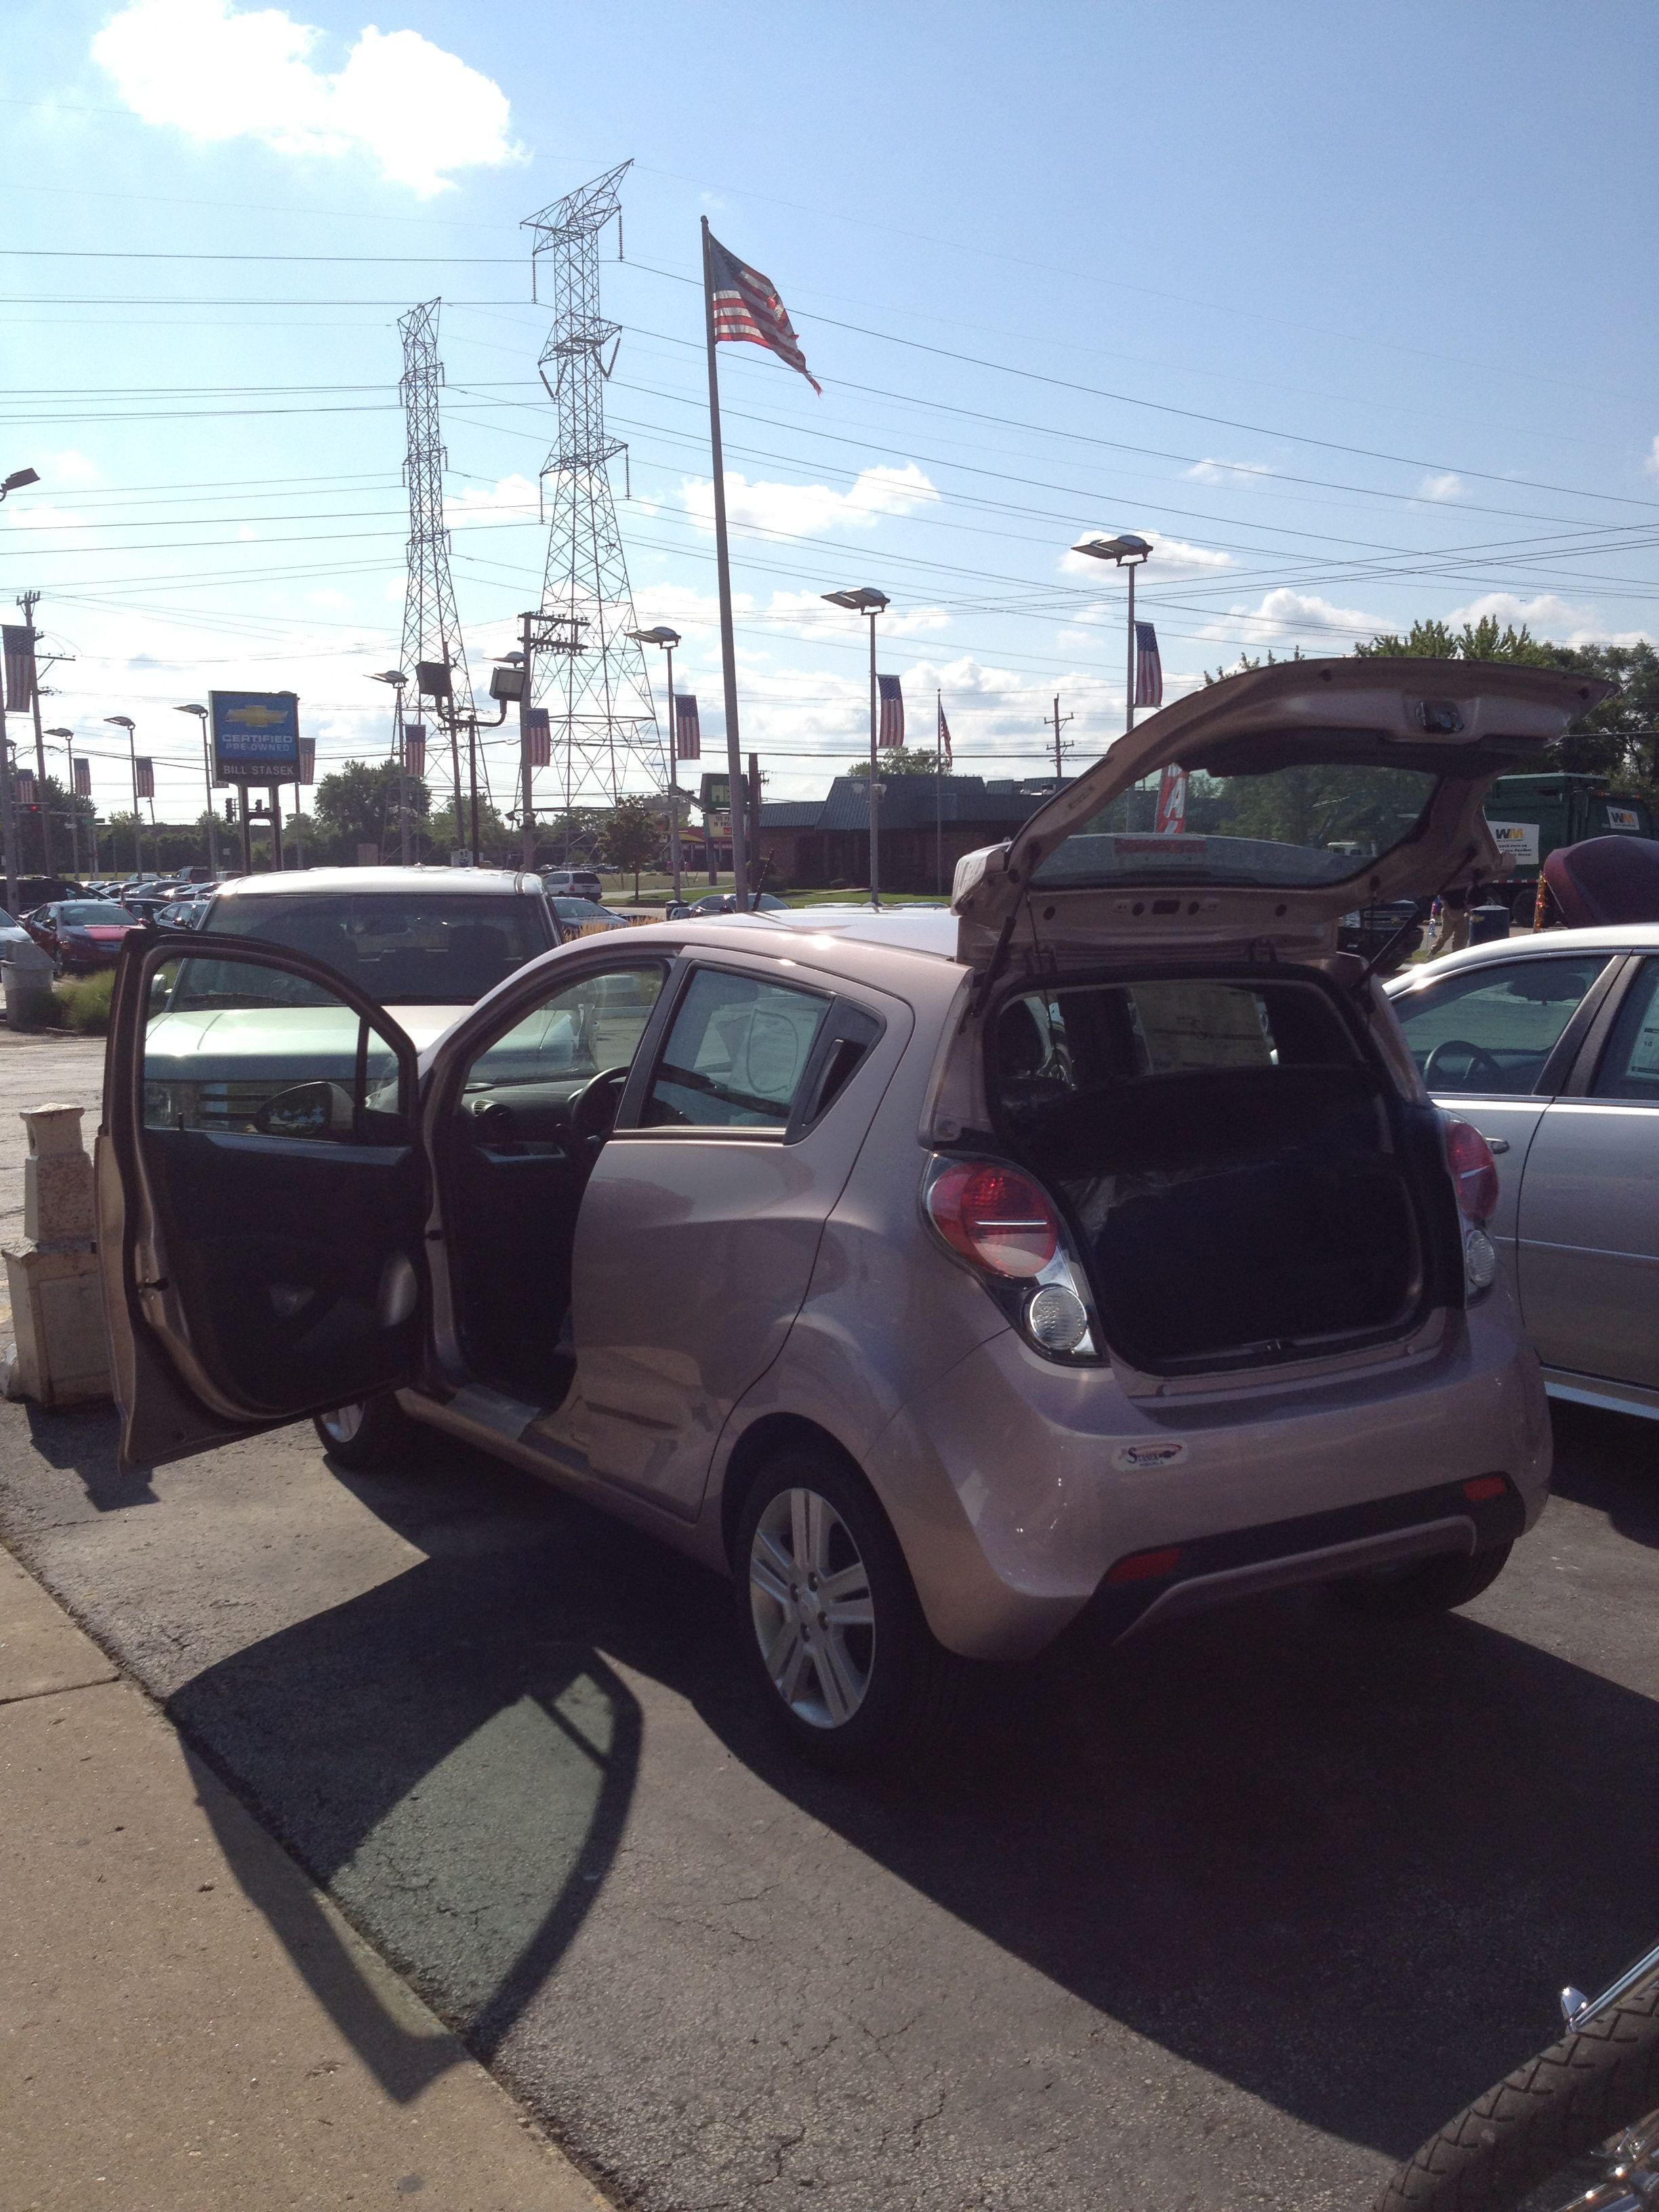 Local Chevy Dealership In Wheeling Il Bill Stasek Chevrolet Spark Chevy Chevy Dealerships Chevrolet Dealership